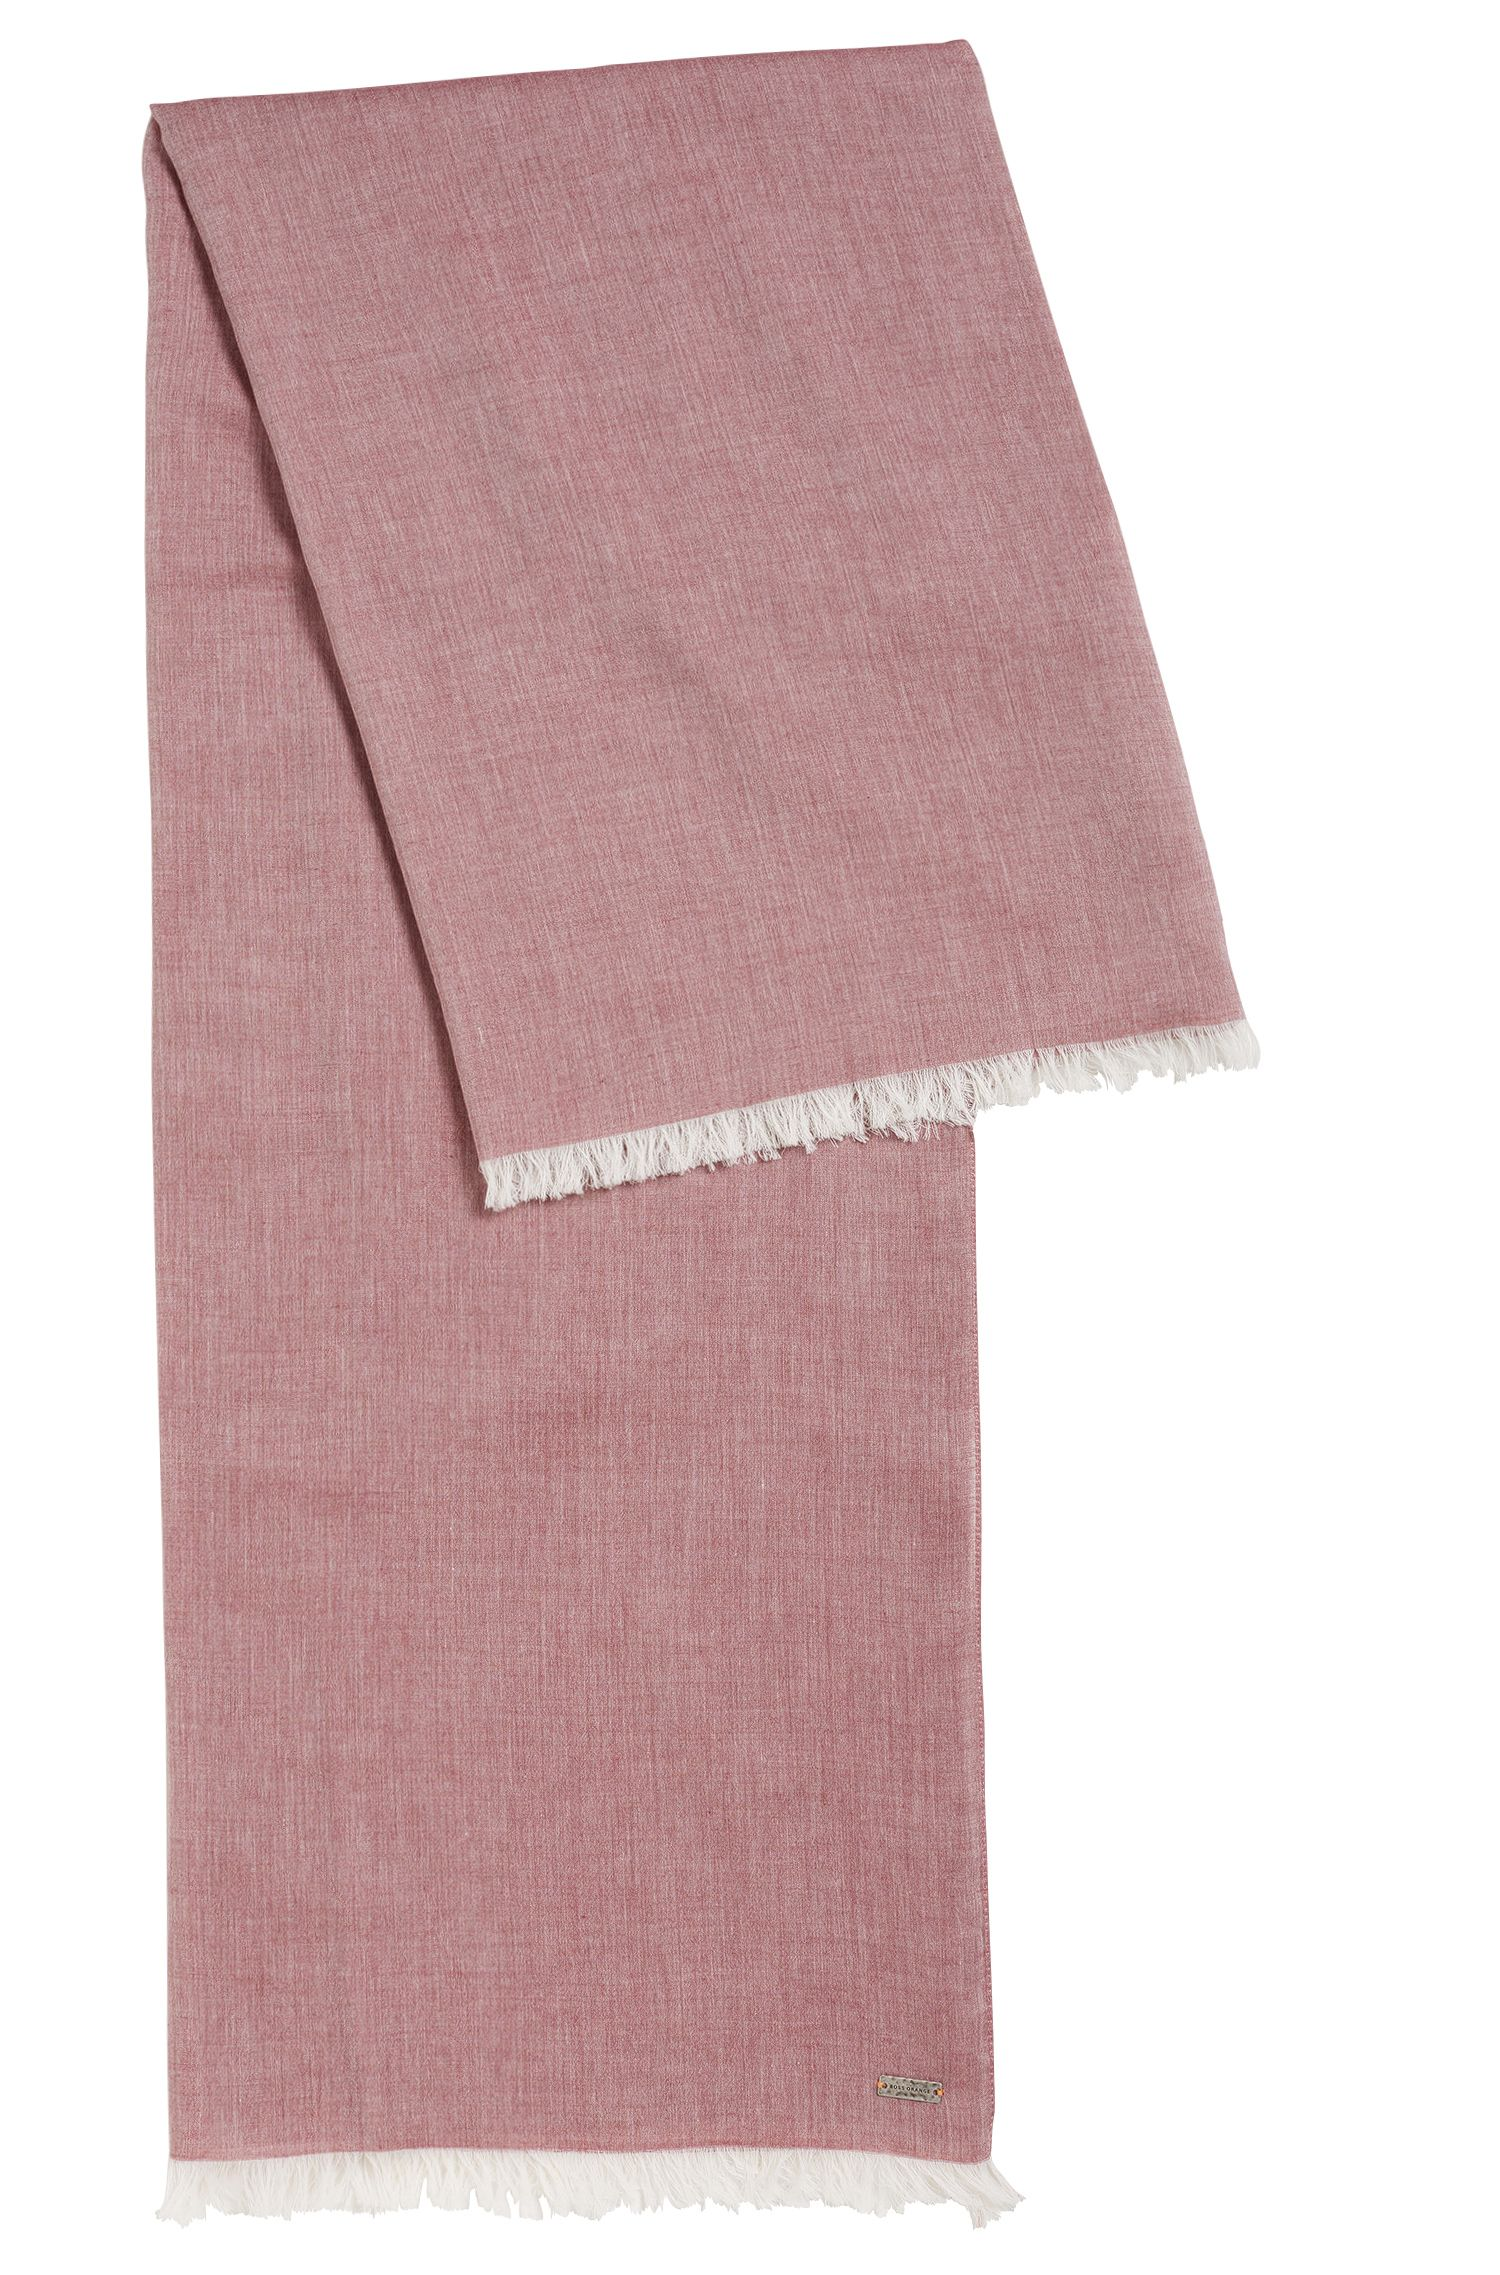 Lightweight scarf with fringe trim